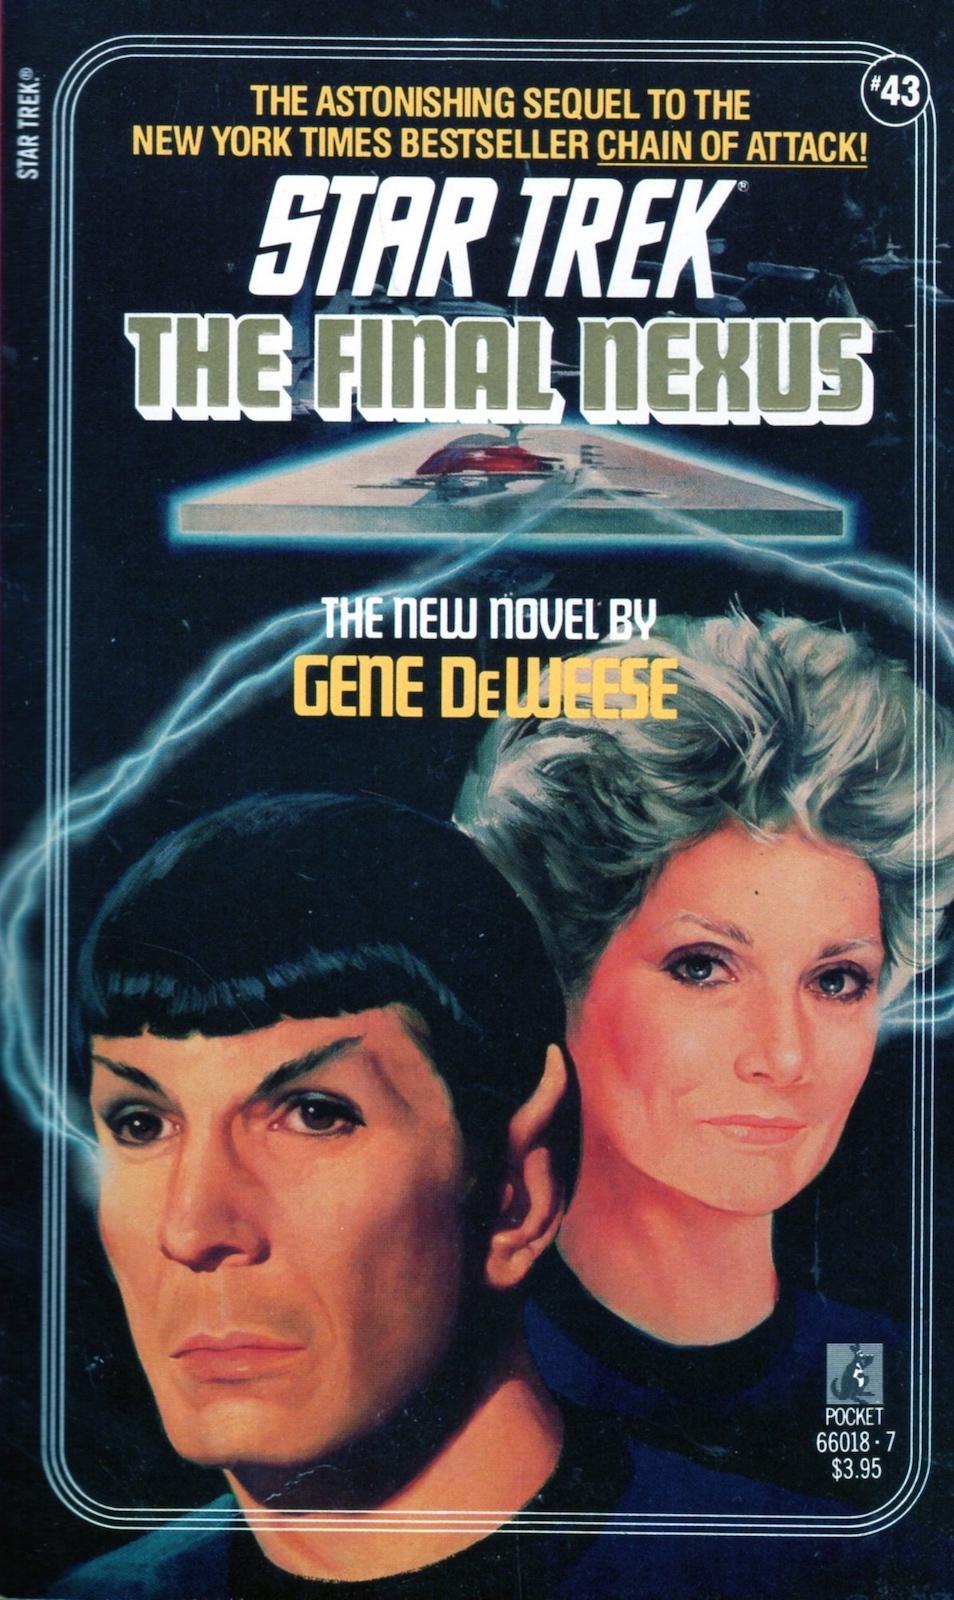 The Final Nexus